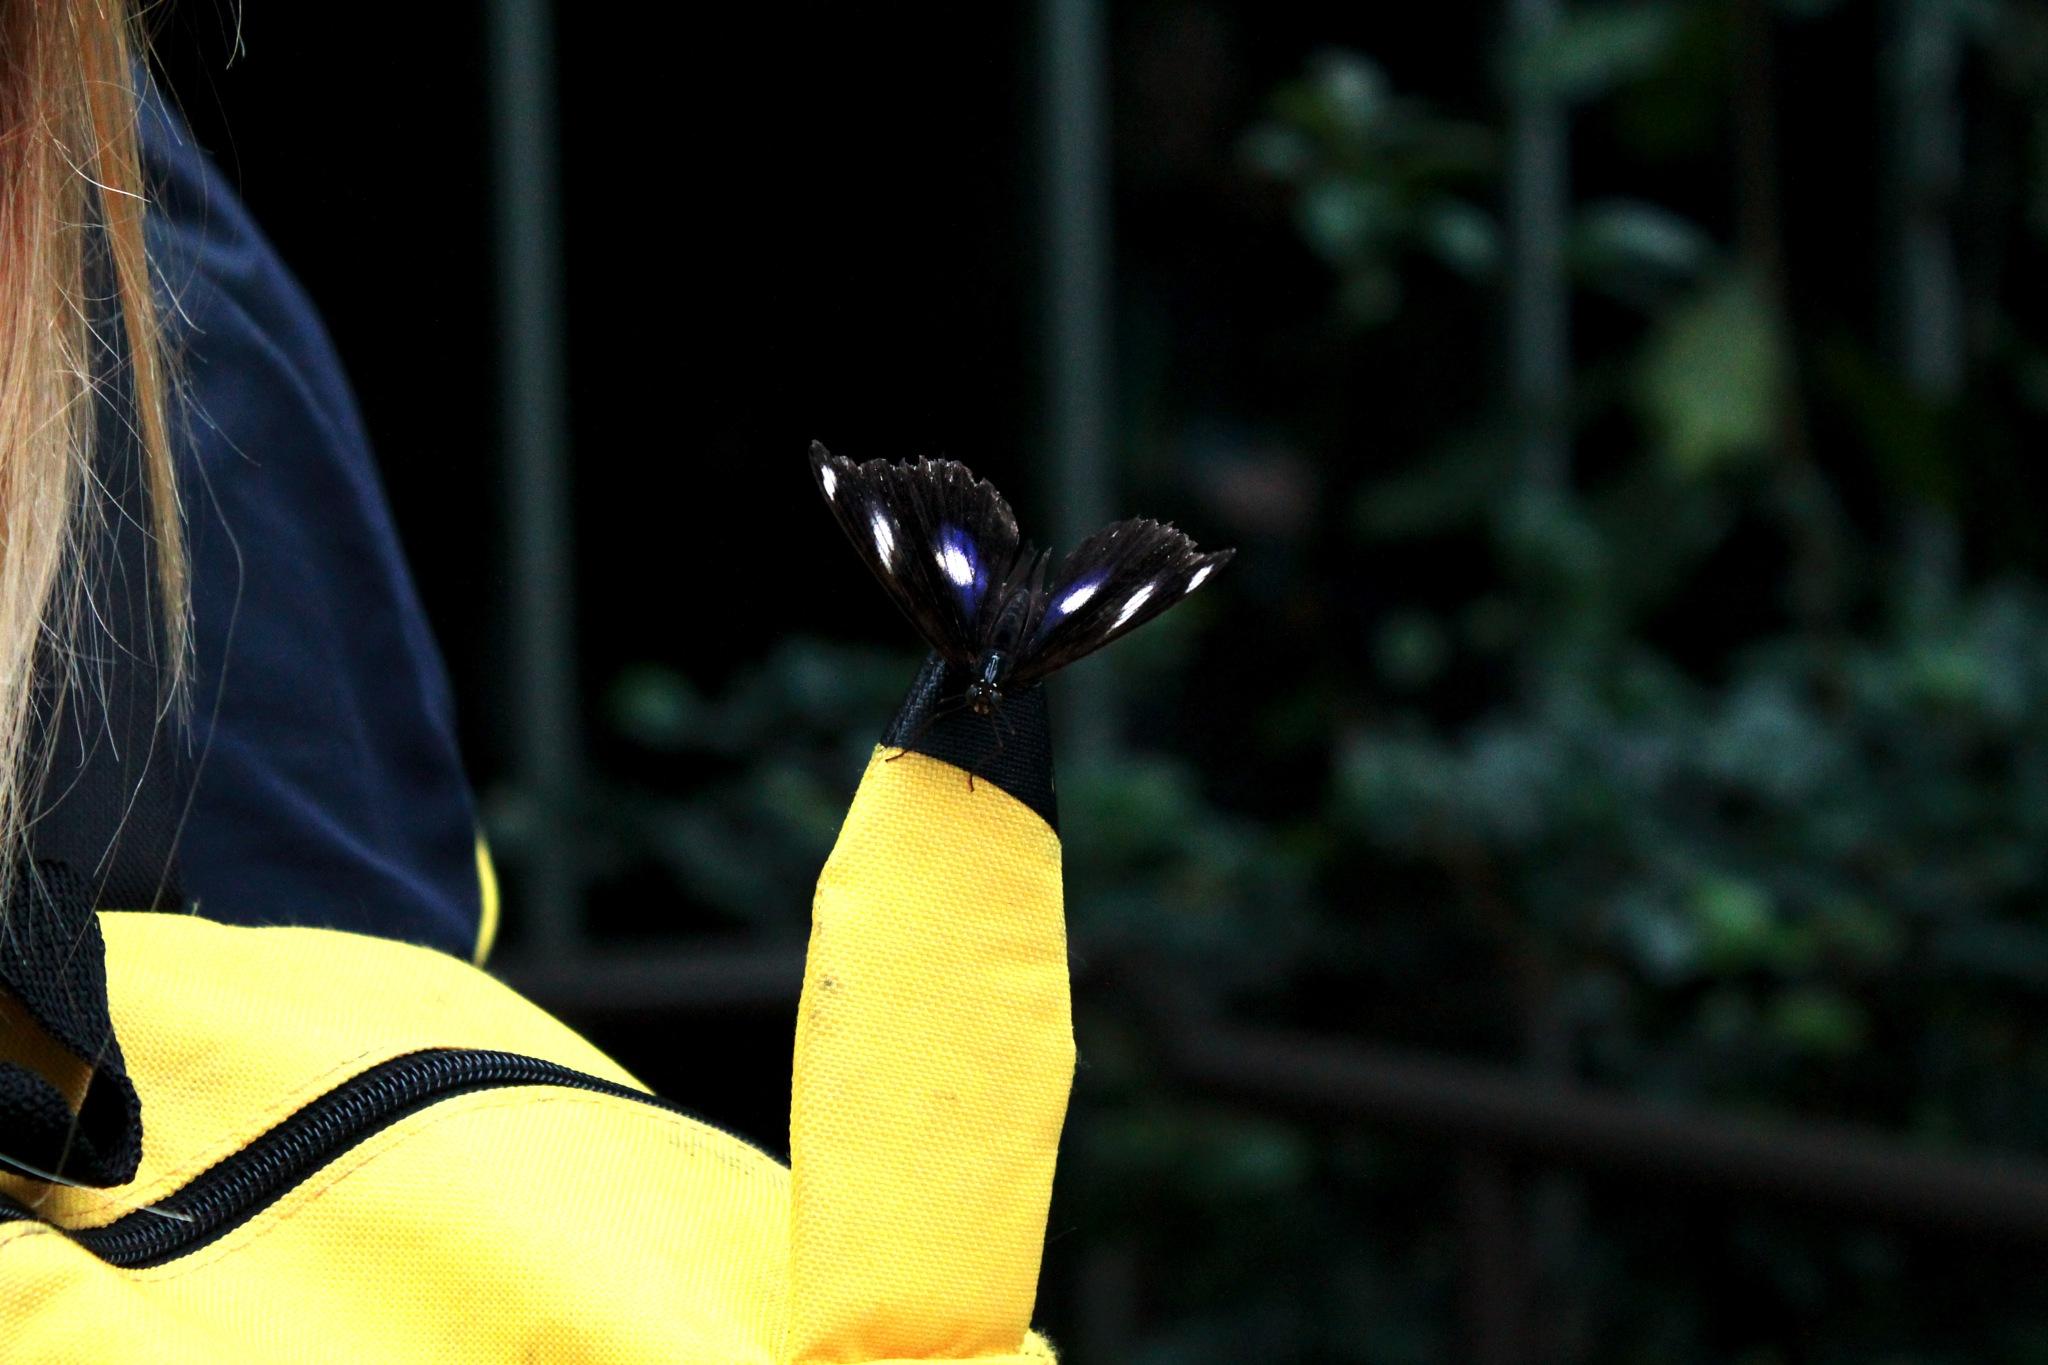 Butterfly 2 by Maddi Jane